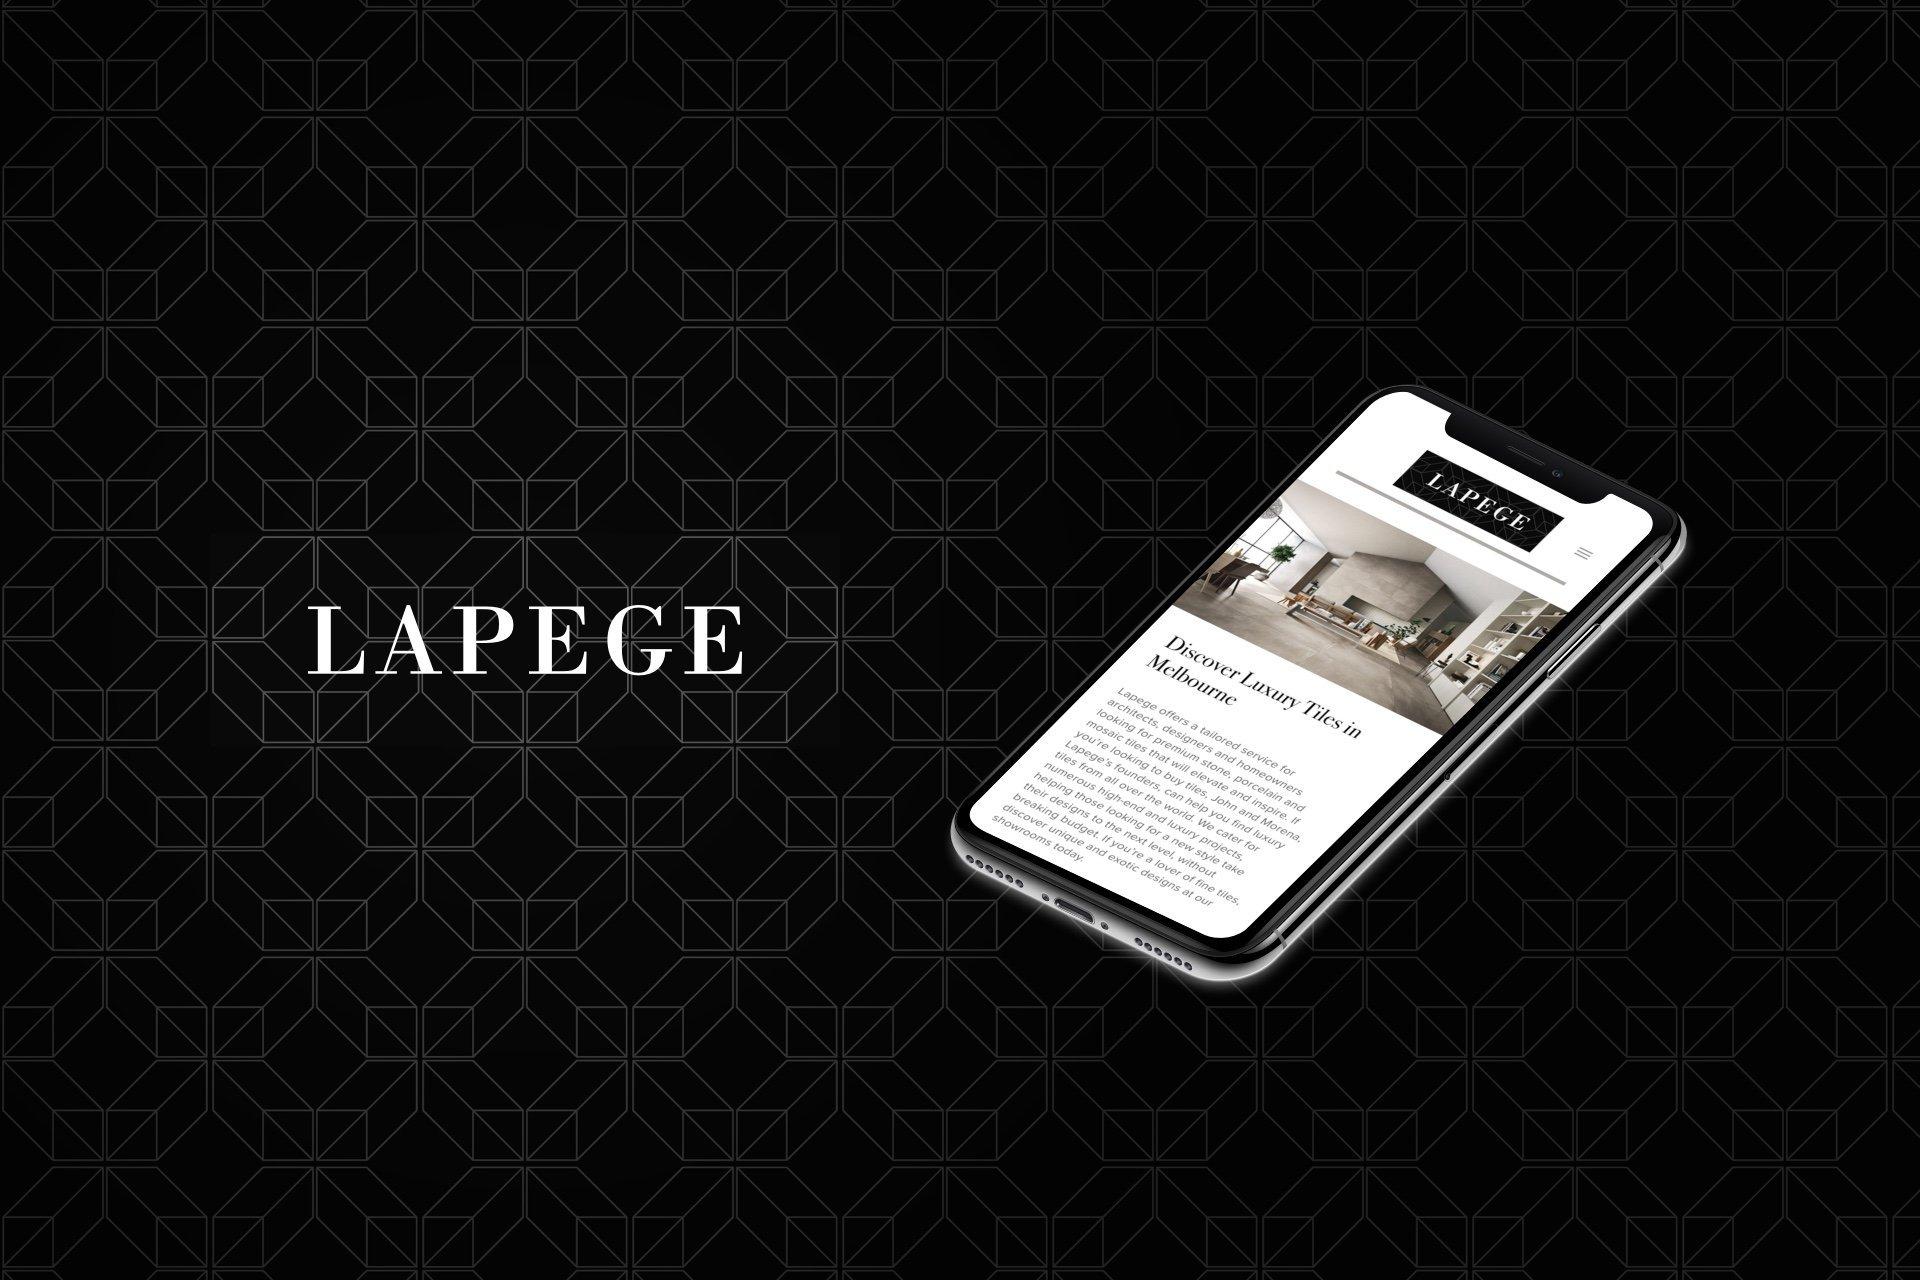 LaPege